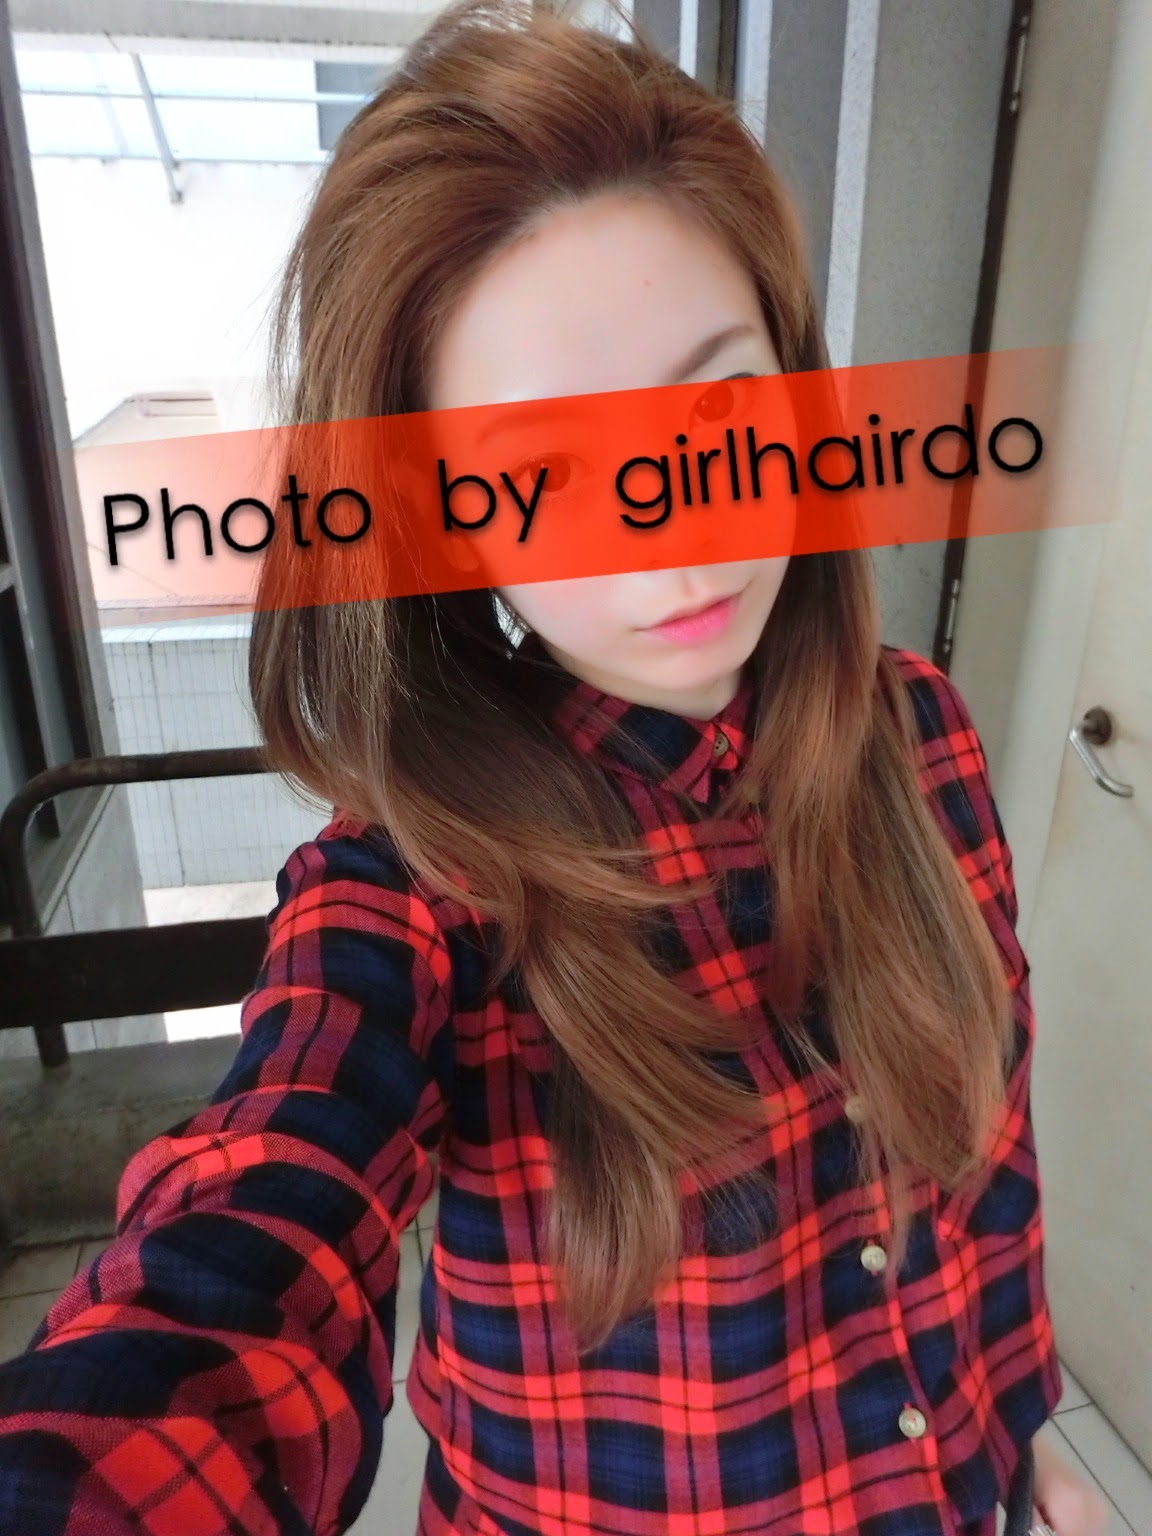 http://1.bp.blogspot.com/-khLxftka0Do/U6cV-2rQJ9I/AAAAAAAAS8E/hc0b1sKe95c/s1600/IMG_2655.JPG